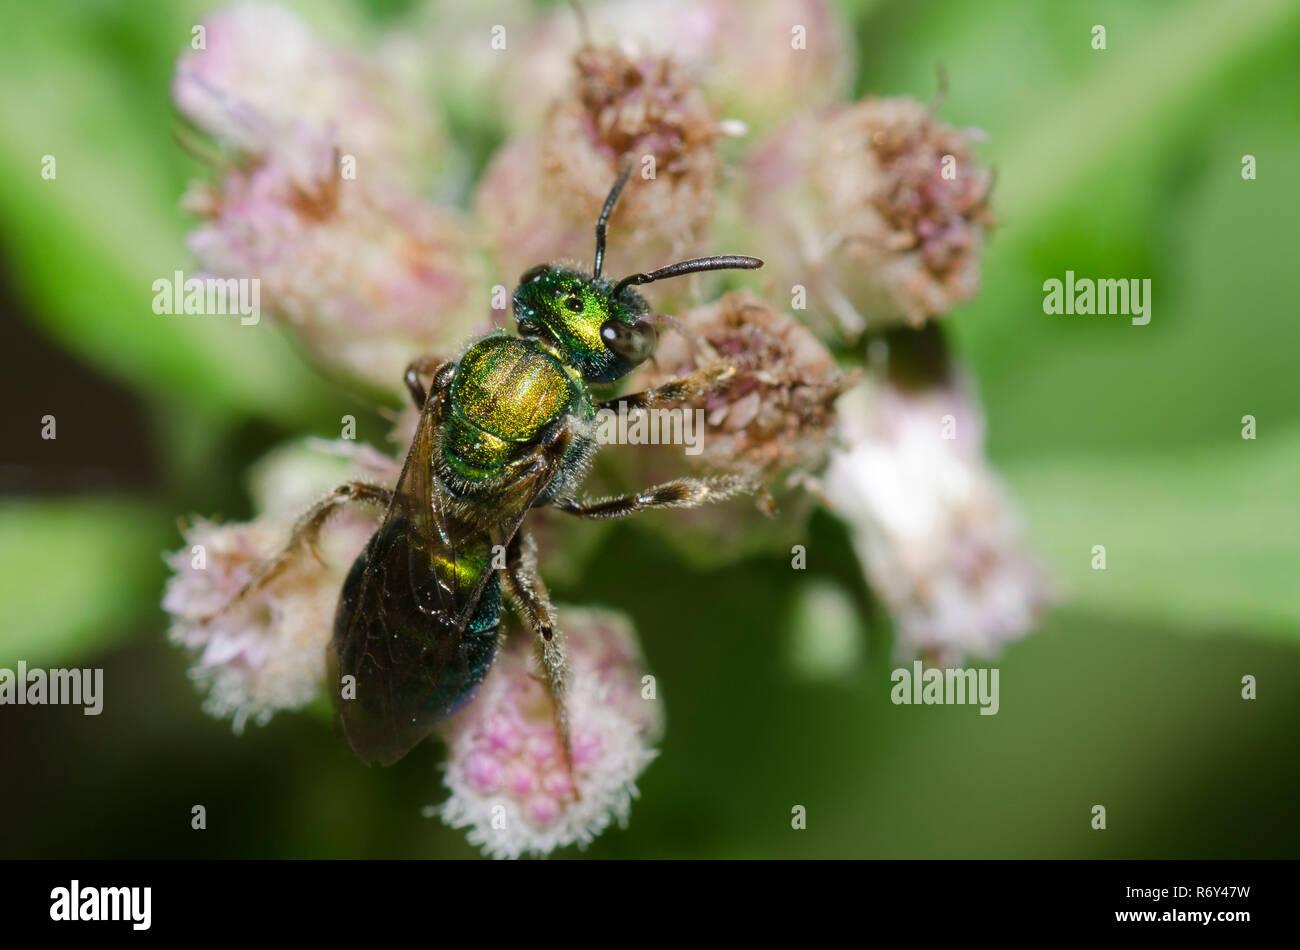 Pure Green Augochlora, Augochlora pura, a type of sweat bee, on Saltmarsh Fleabane, Pluchea odorata - Stock Image